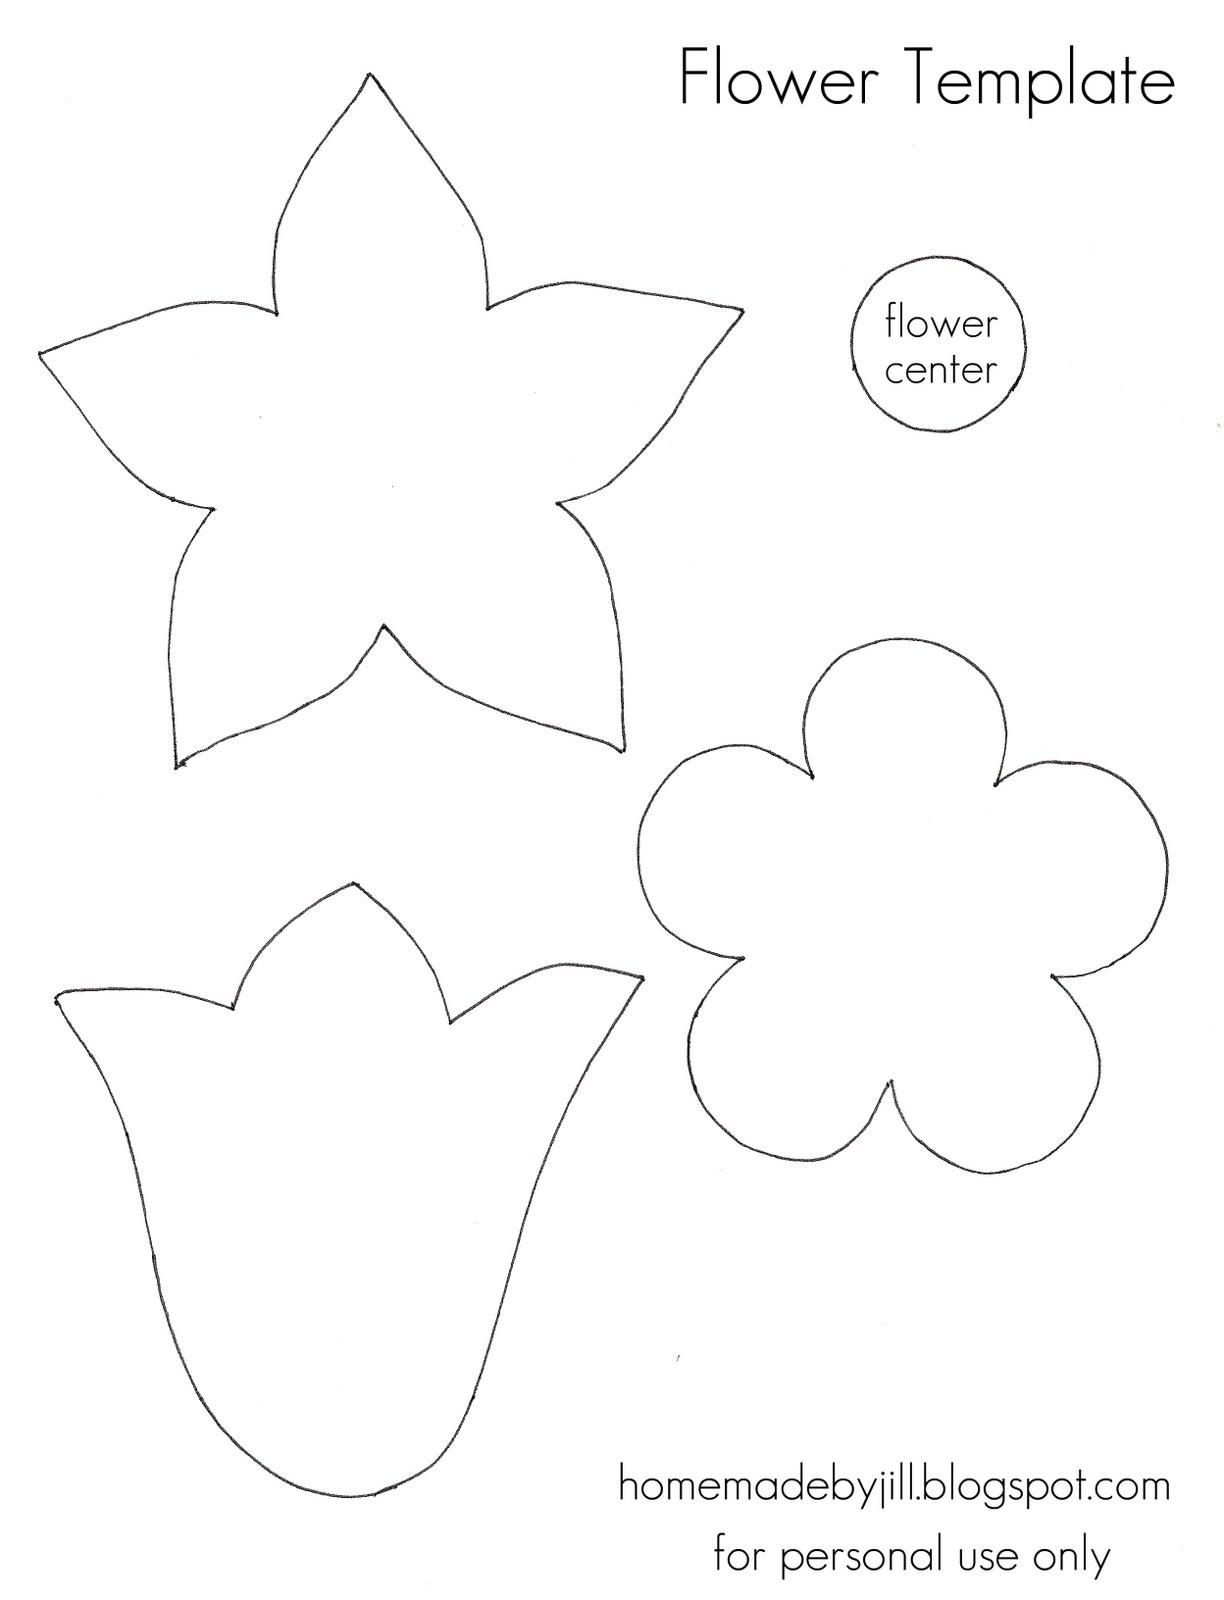 free printable flower templates. Black Bedroom Furniture Sets. Home Design Ideas